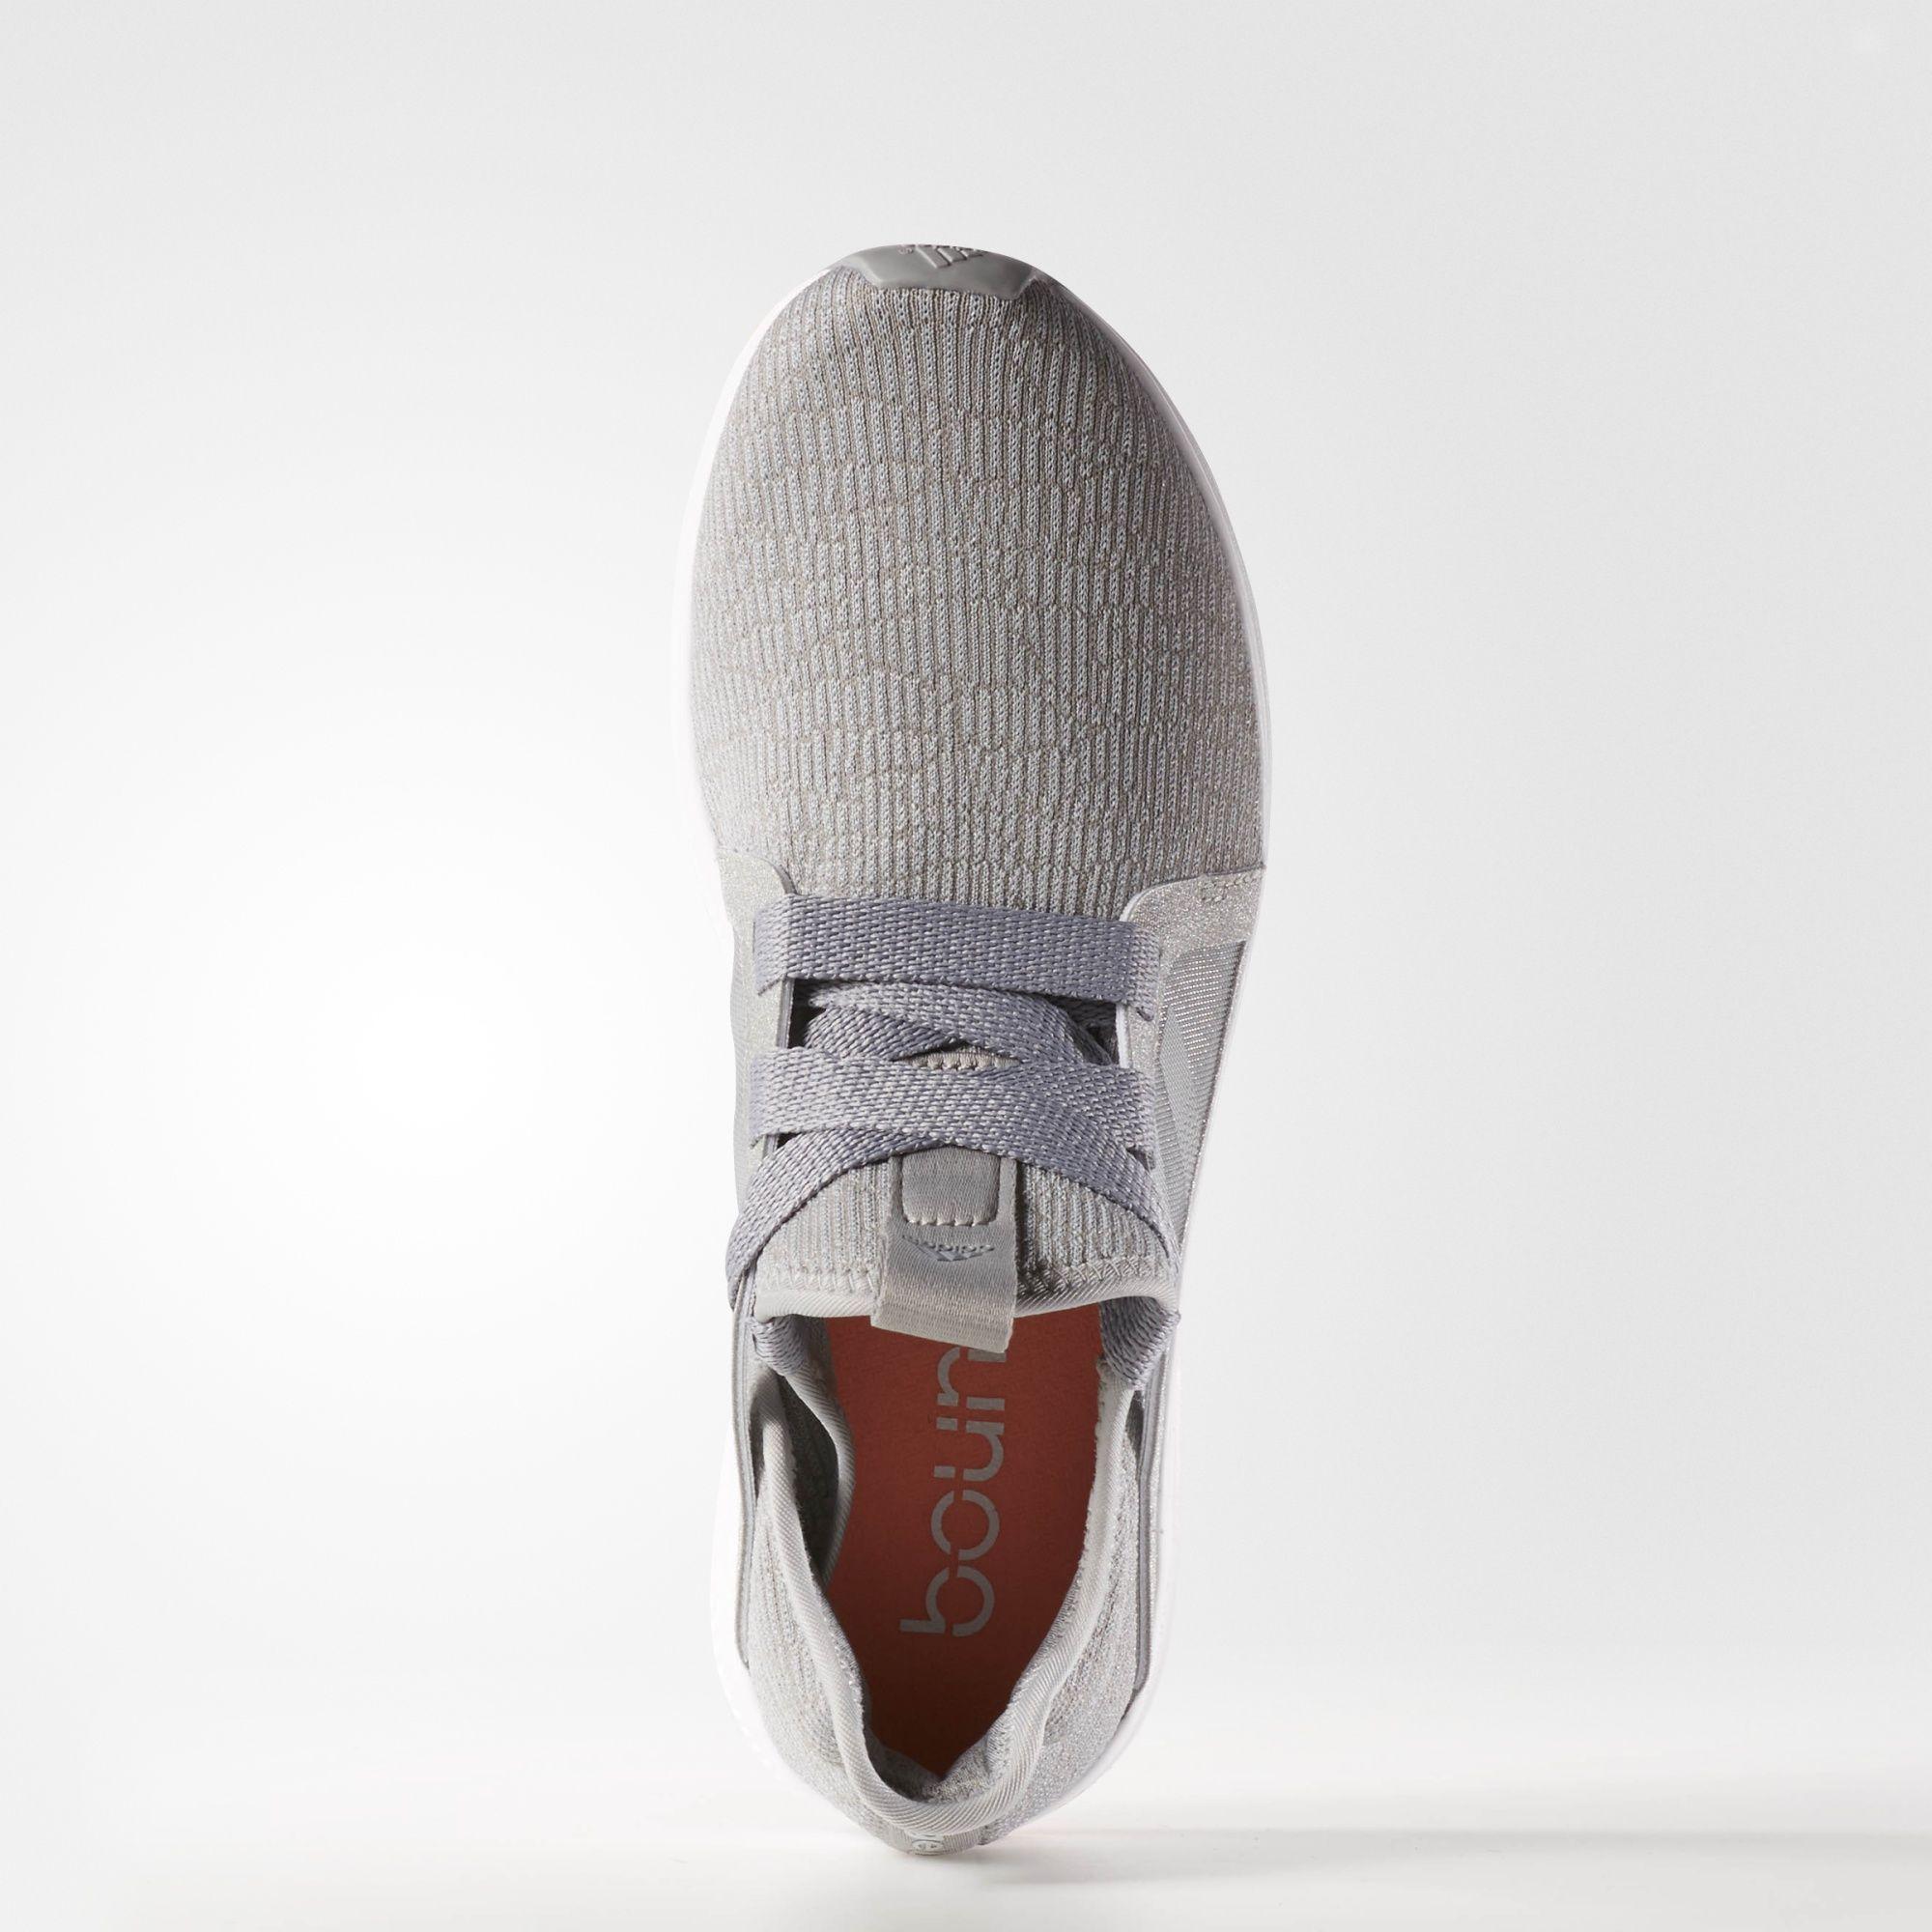 Autunno / inverno scarpe adidas edge luxe 2016 pinterest adidas